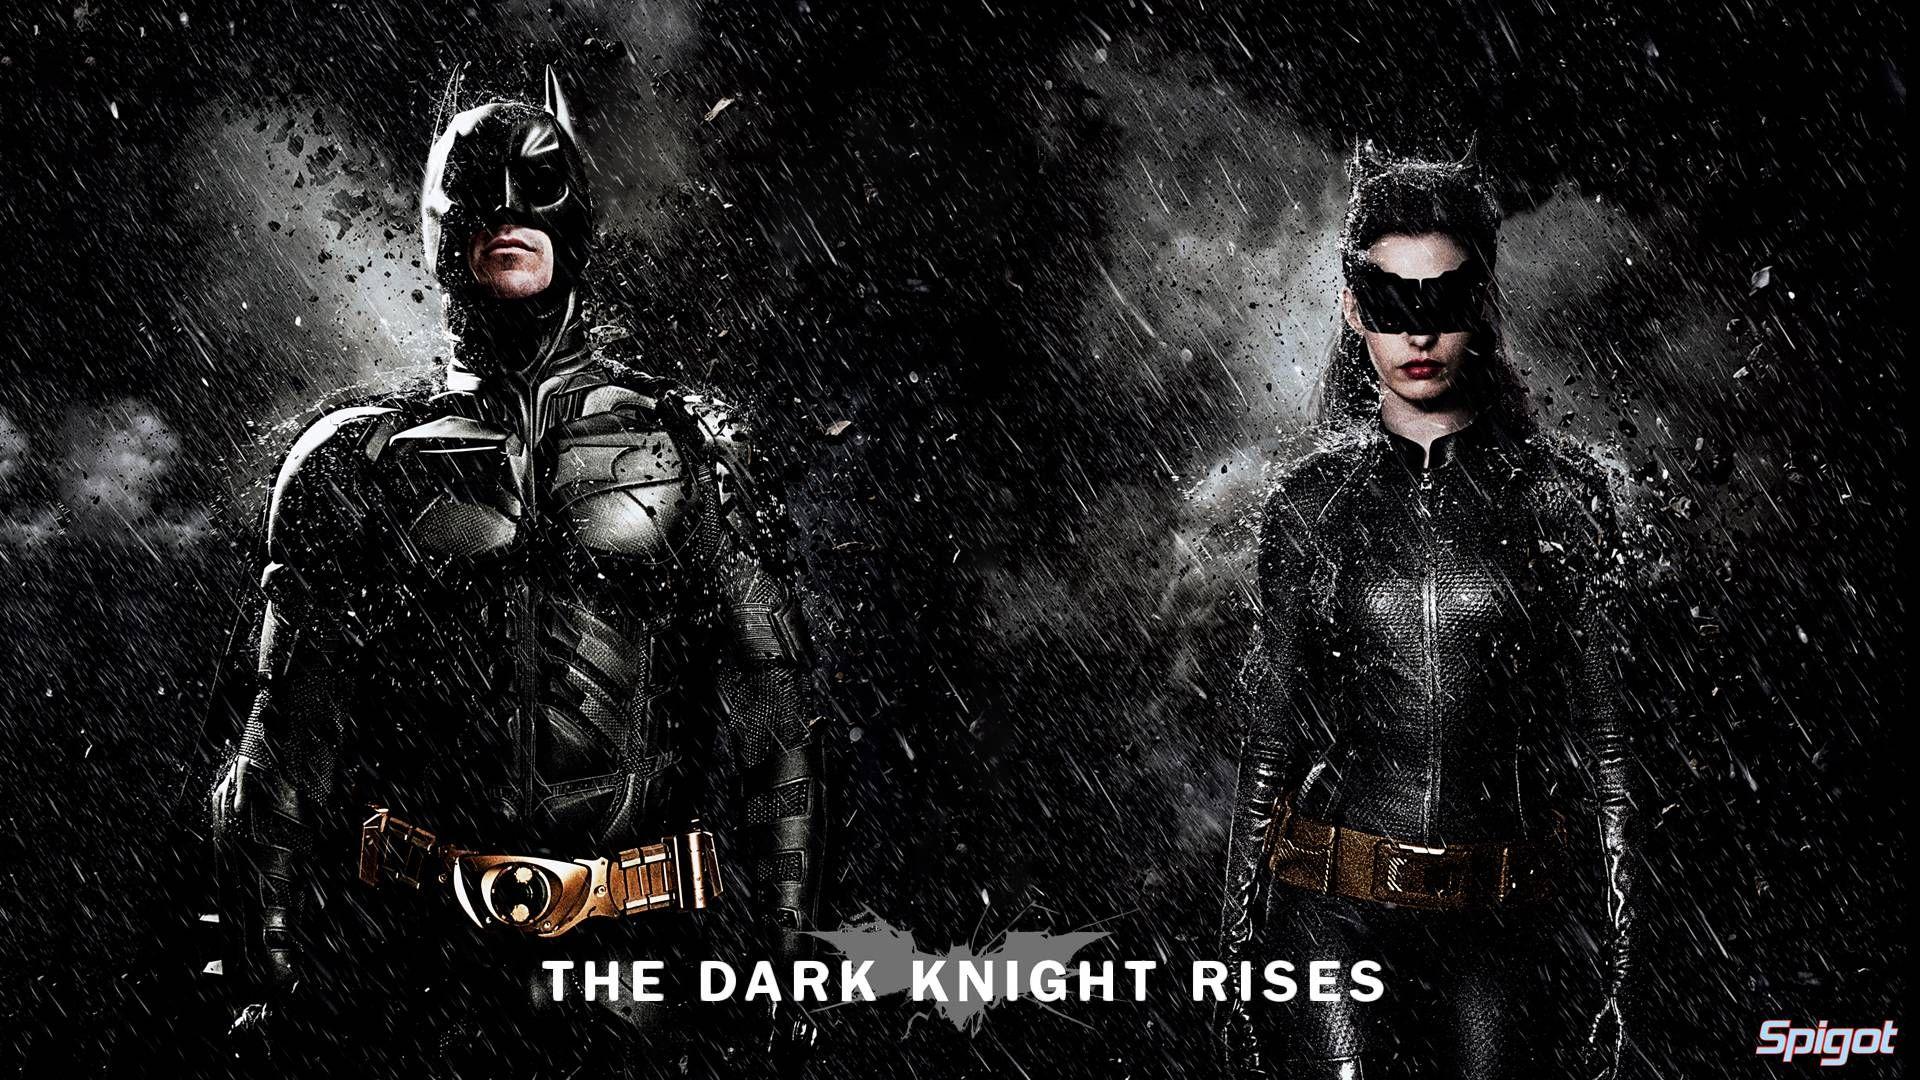 The Dark Knight Rises Wallpapers Hd Wallpaper